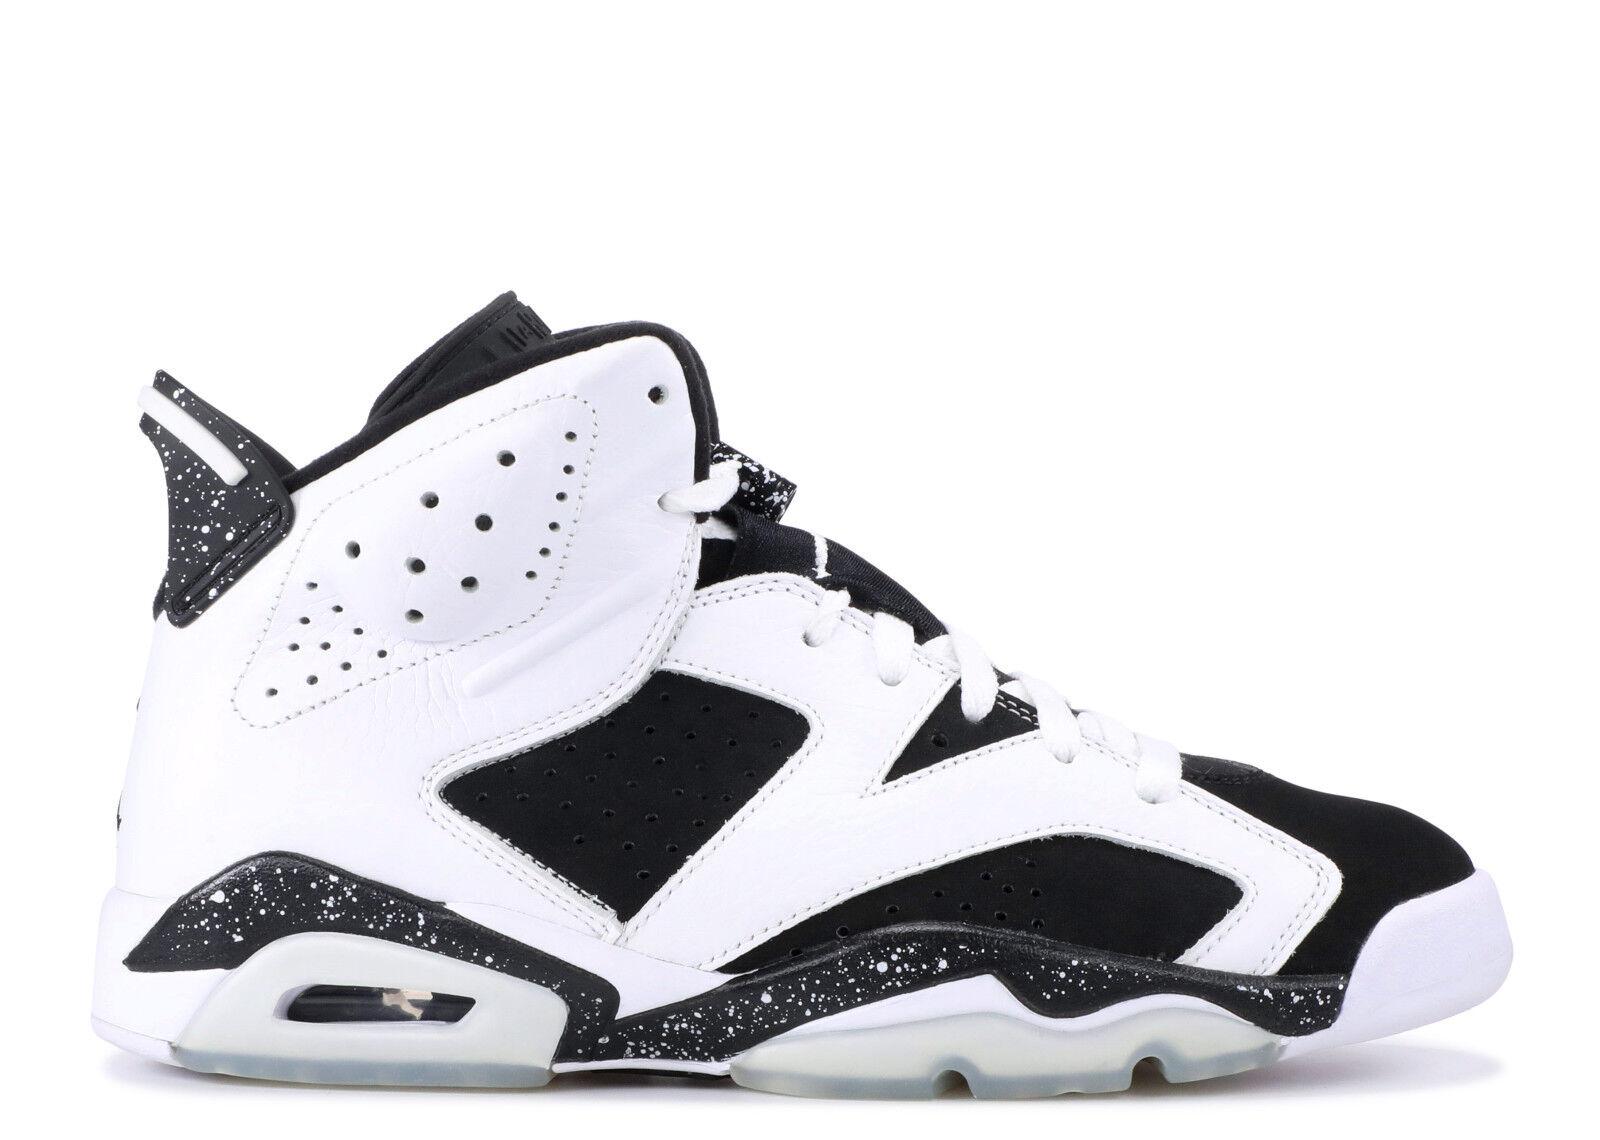 Nike Air Jordan 6 VI Oreo Size 9